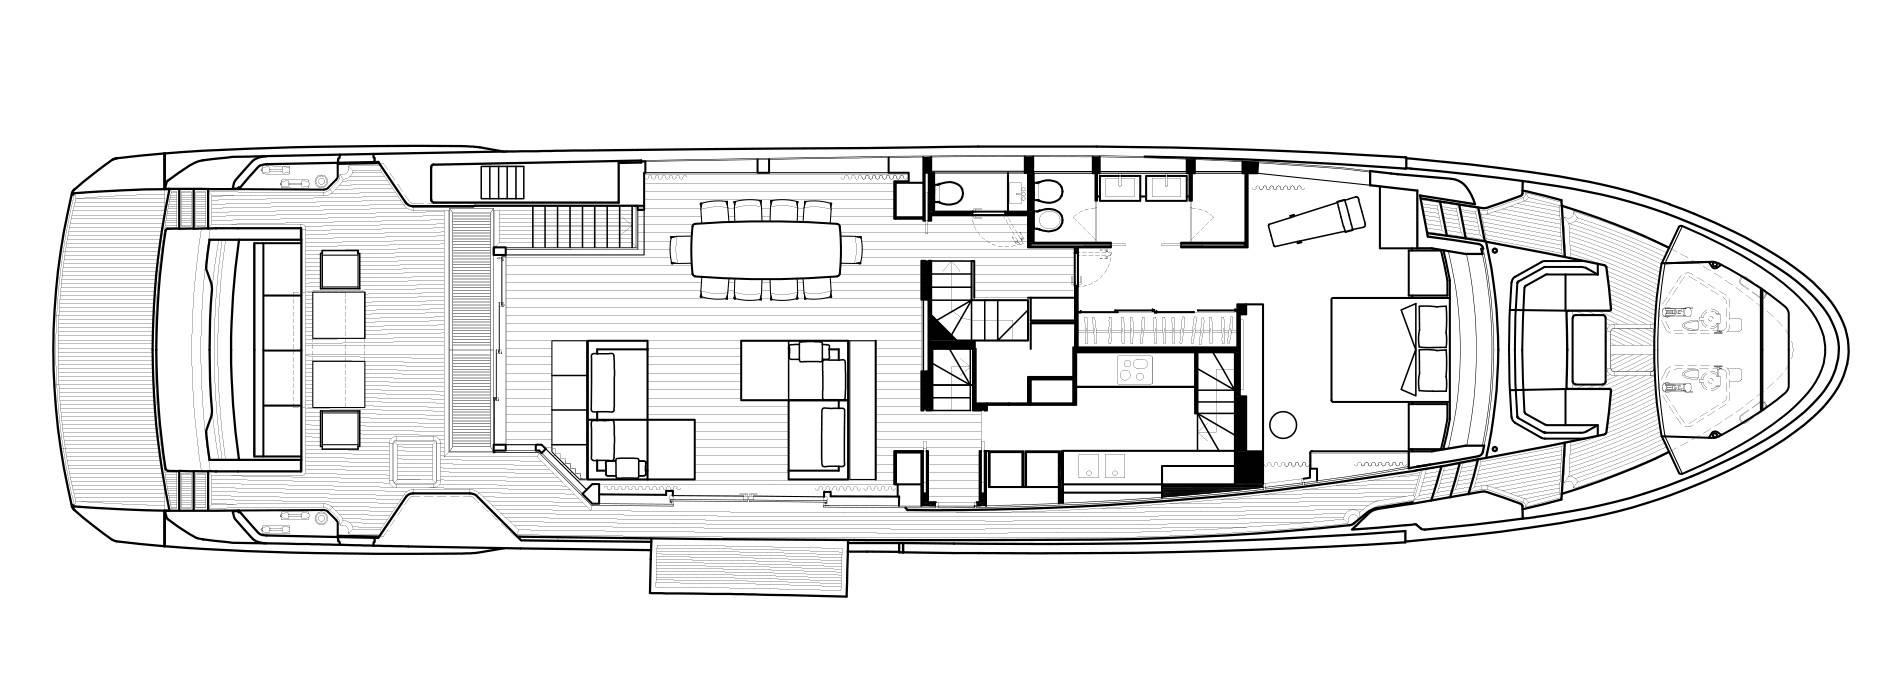 Sanlorenzo Yachts SL102 Asymmetric Cubierta principal